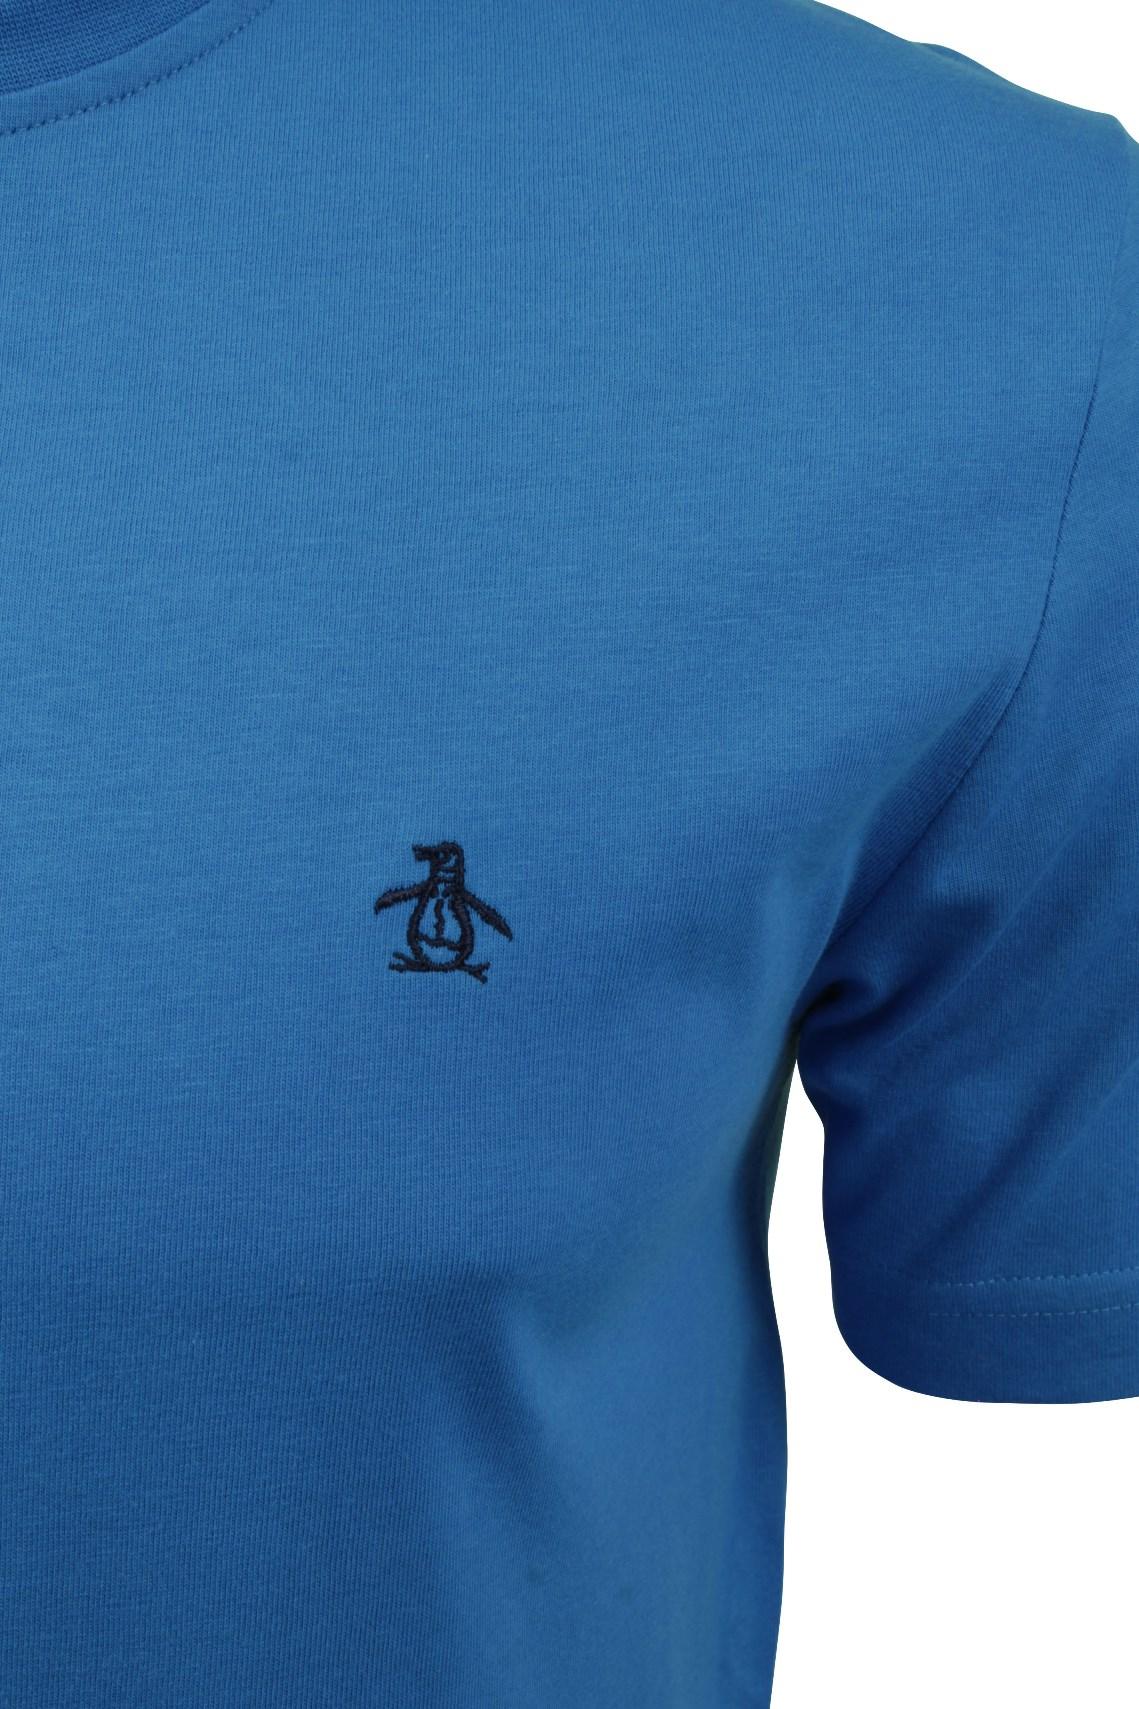 Mens-T-Shirt-by-Original-Penguin-Crew-Neck-Short-Sleeved thumbnail 22